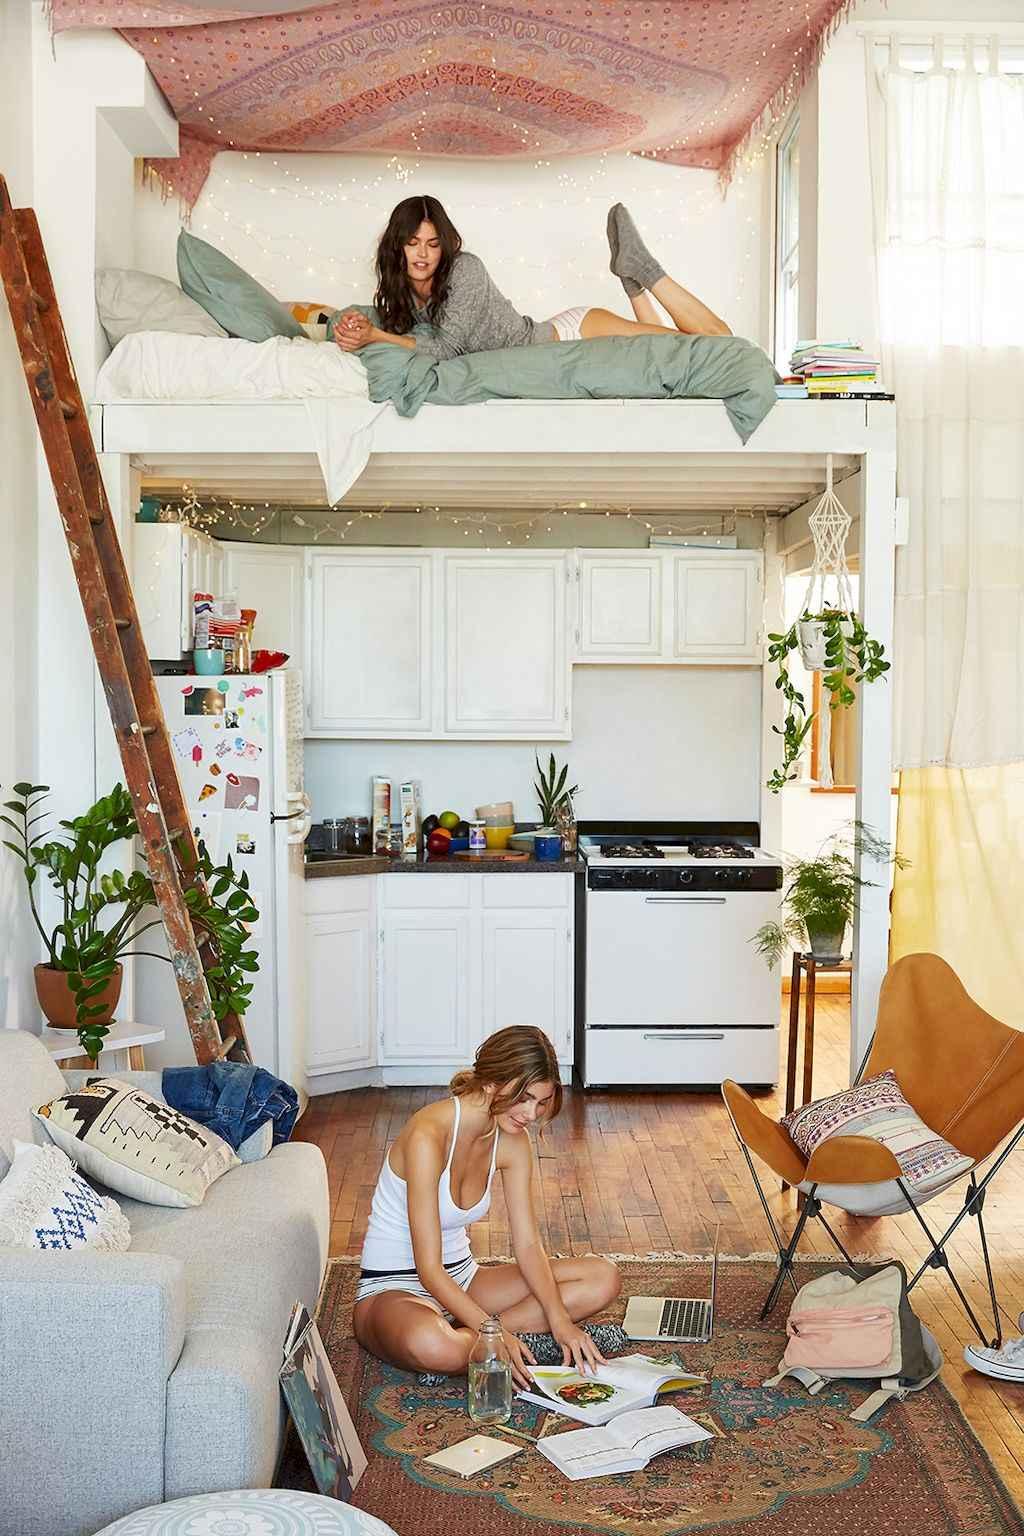 Cool creative loft apartment decorating ideas (56)